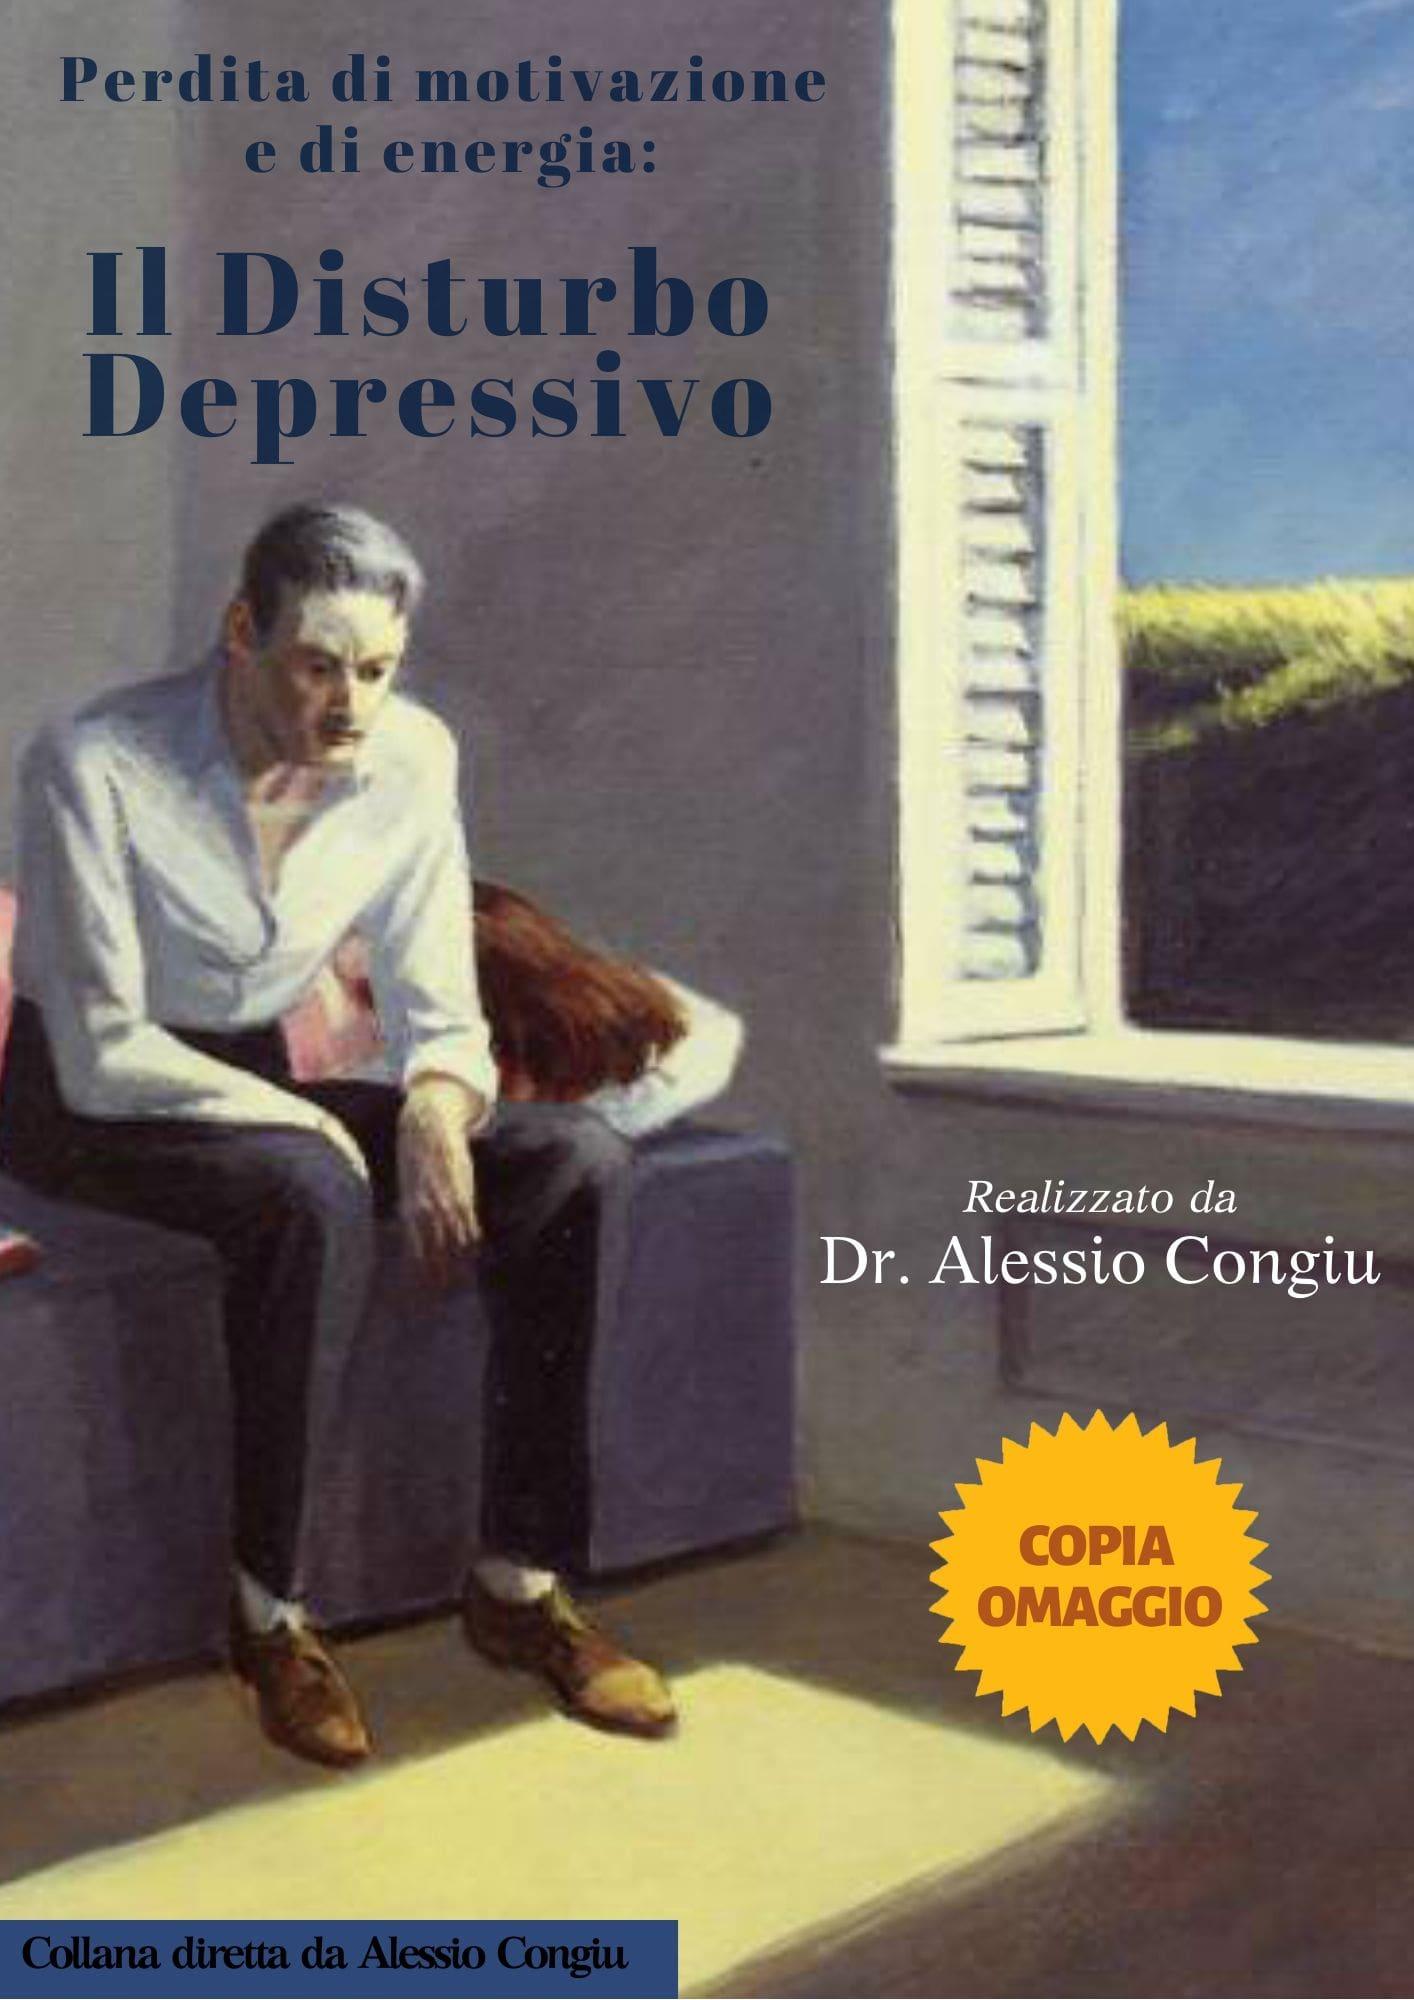 depressione verona